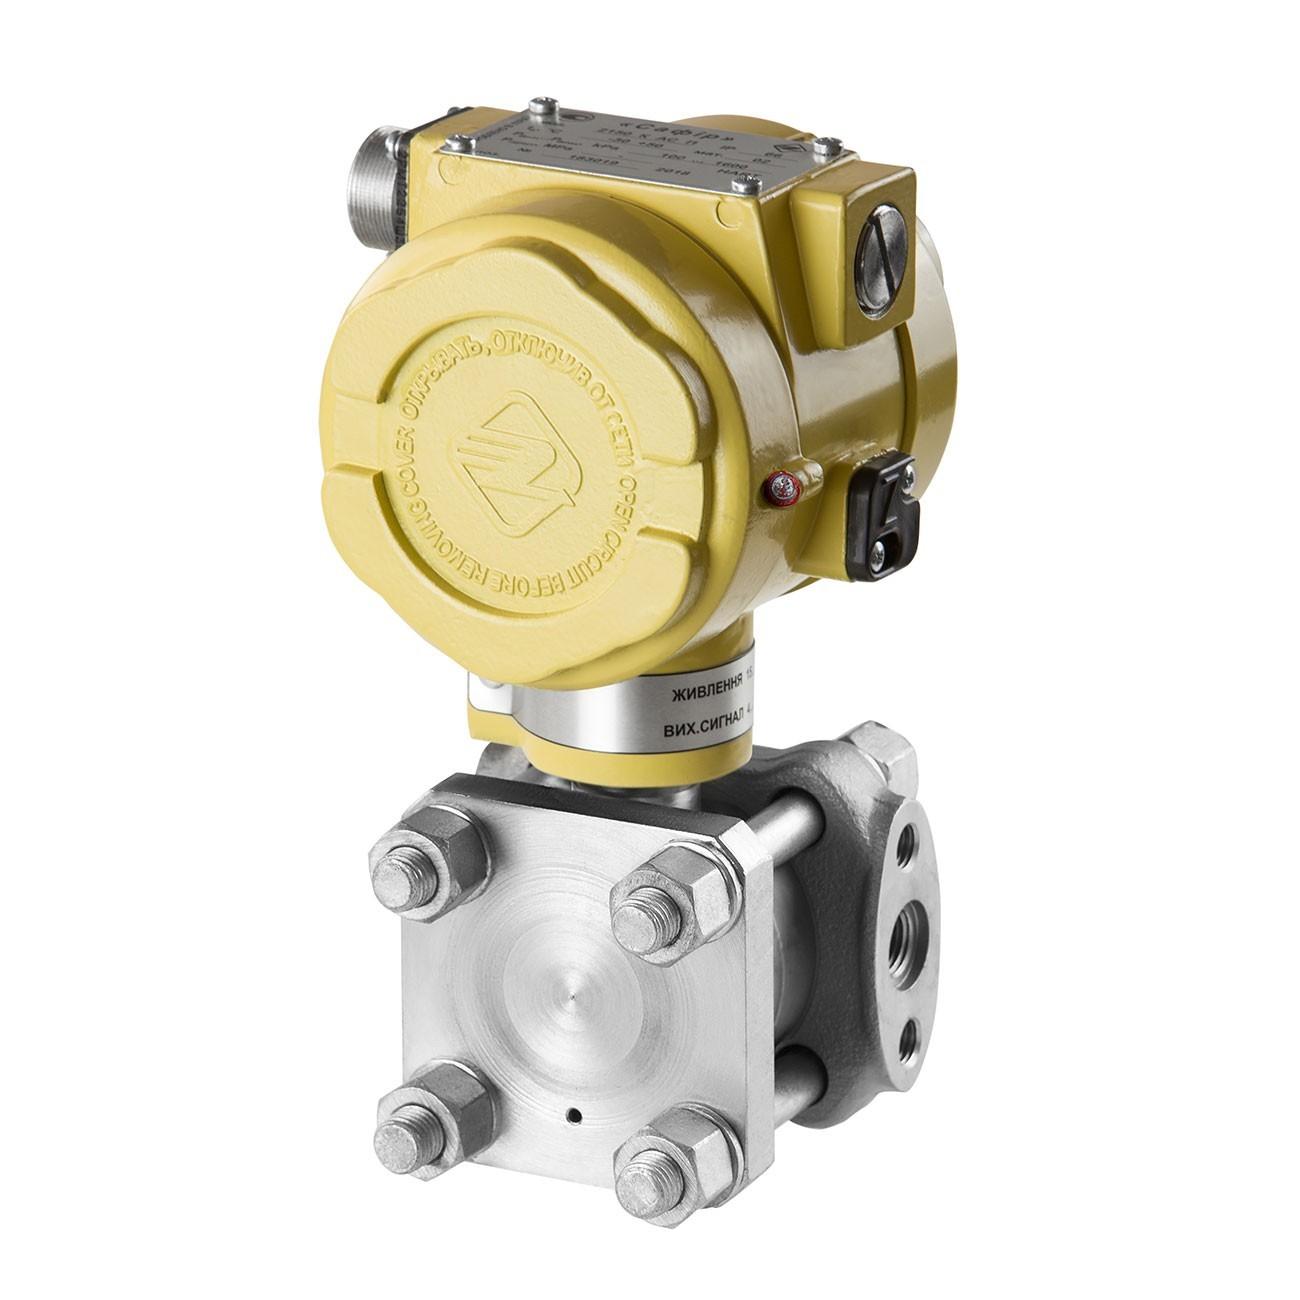 Analog Gauge Pressure Transmitters Safir 2110, 2210, 2310